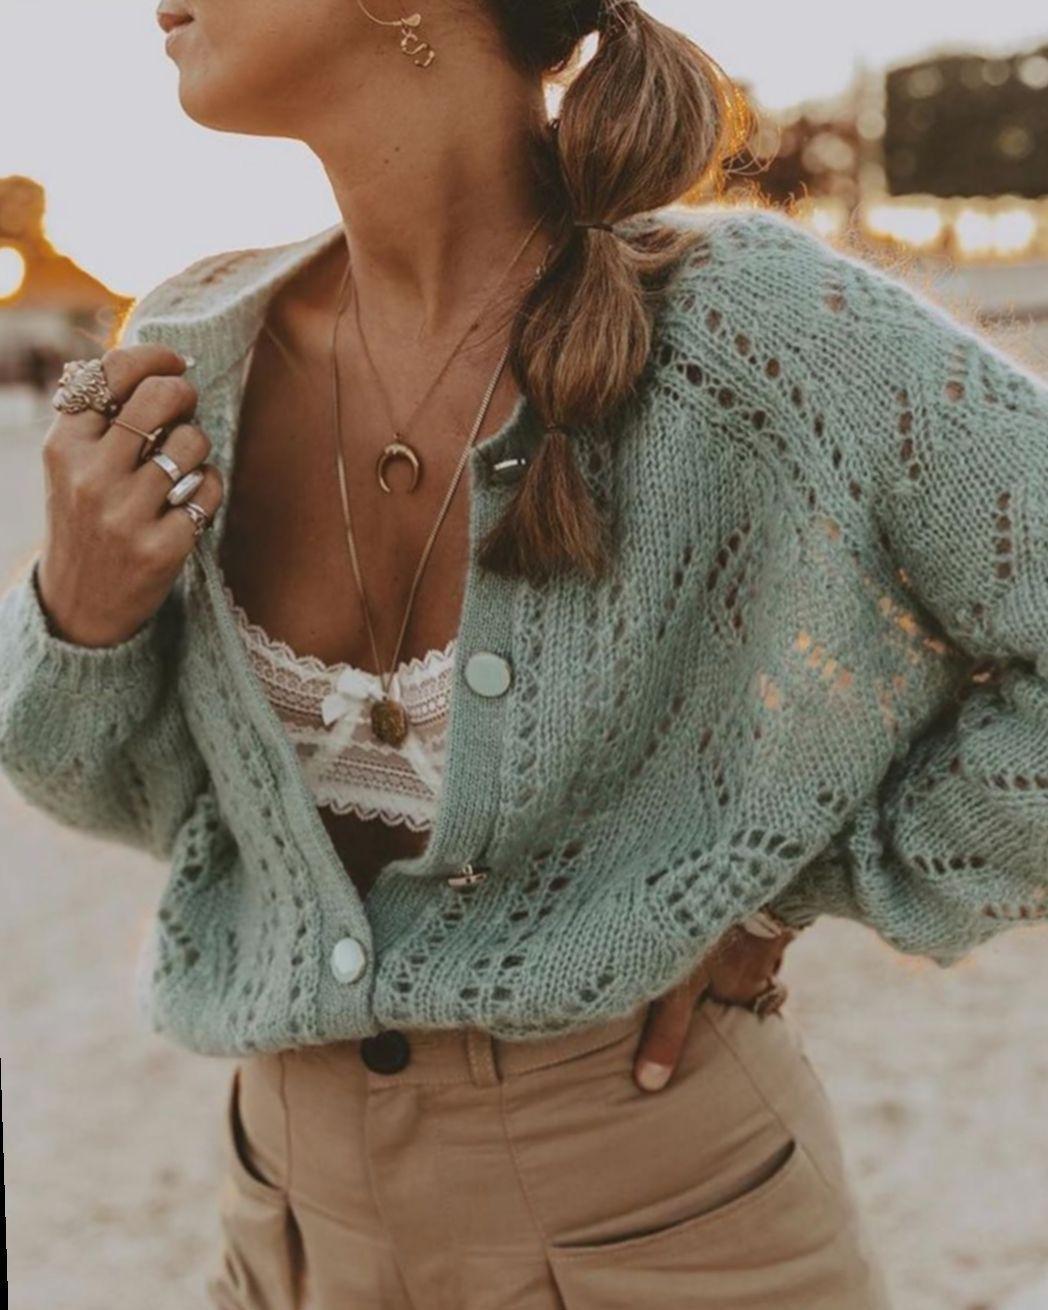 Fashion Inspo Summer Cardigans #instgram #instaclick #gimaashi - Welcome to Blog